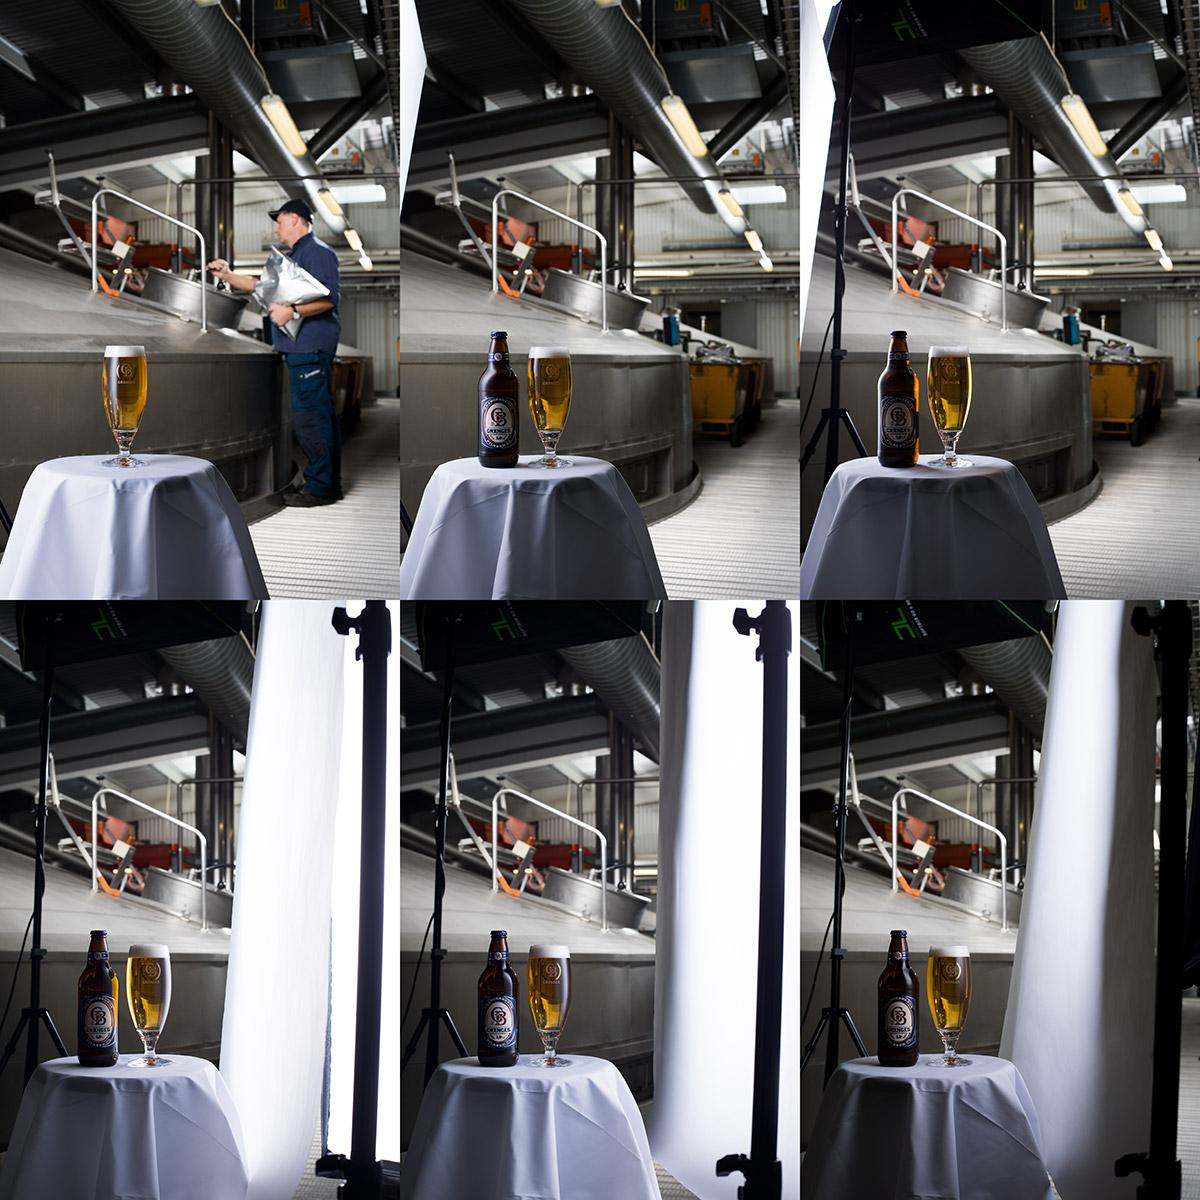 Omslagsbild Spendrups restaurangsortiment 2018, bakom kameran, Grängesberg bryggeri. Bild: Fotograf Markus P